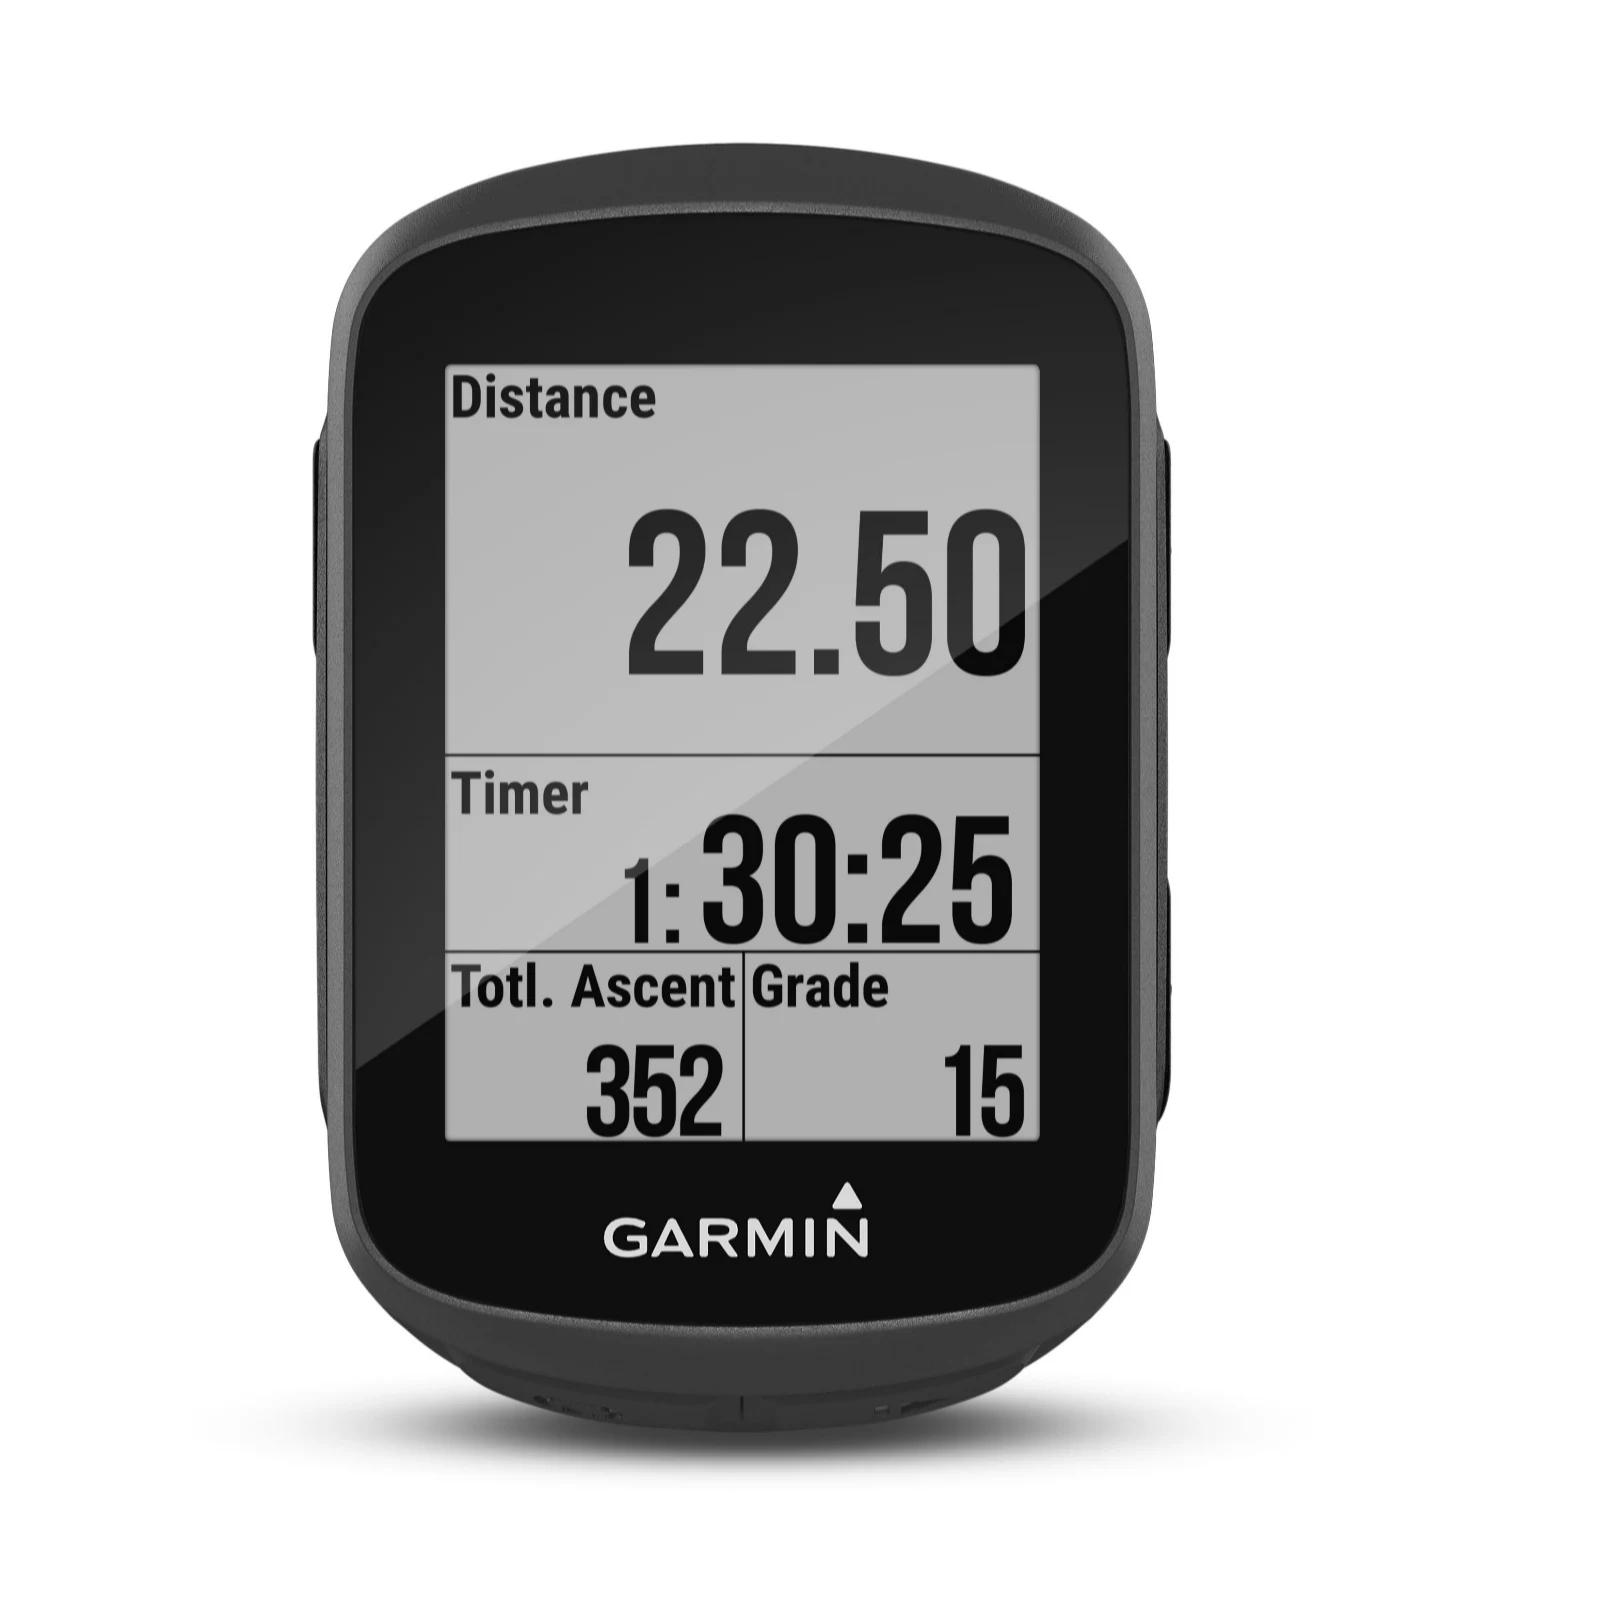 Garmin Edge 130 Cycling computer £94.98 + £4.95 del @ QVC (£5 new member discount available)